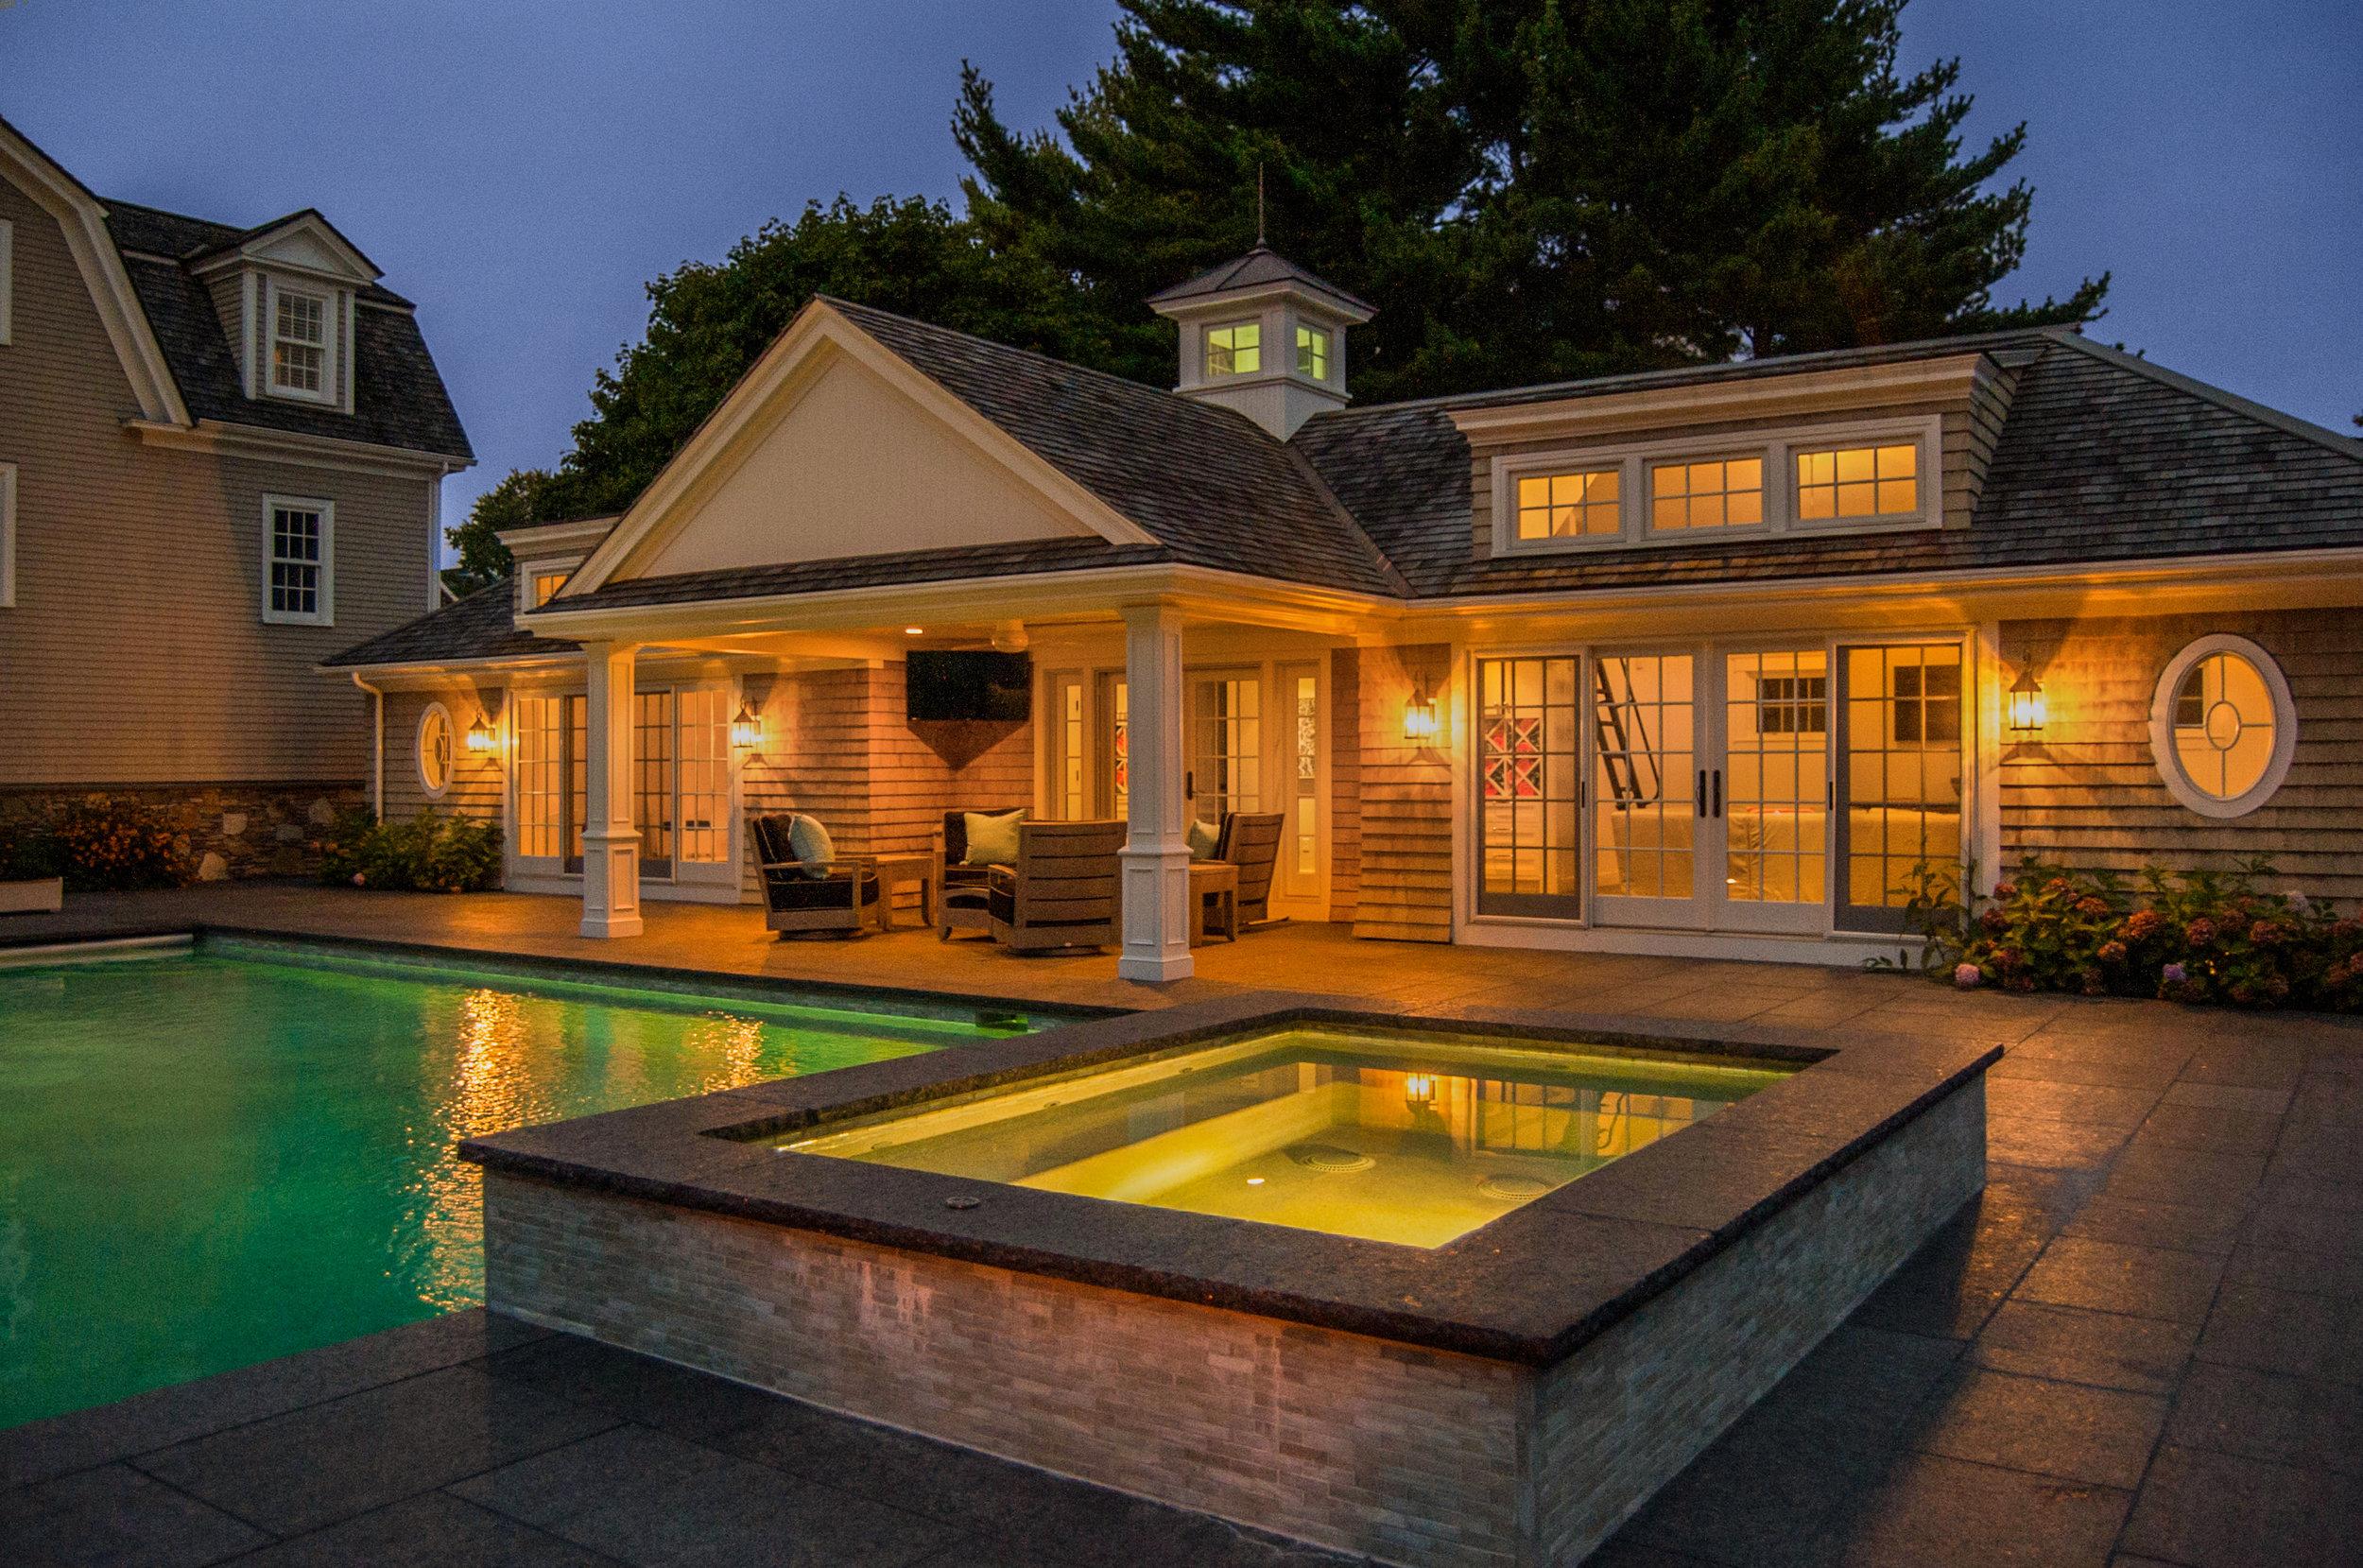 Hingham Pool House Exterior 1.jpg